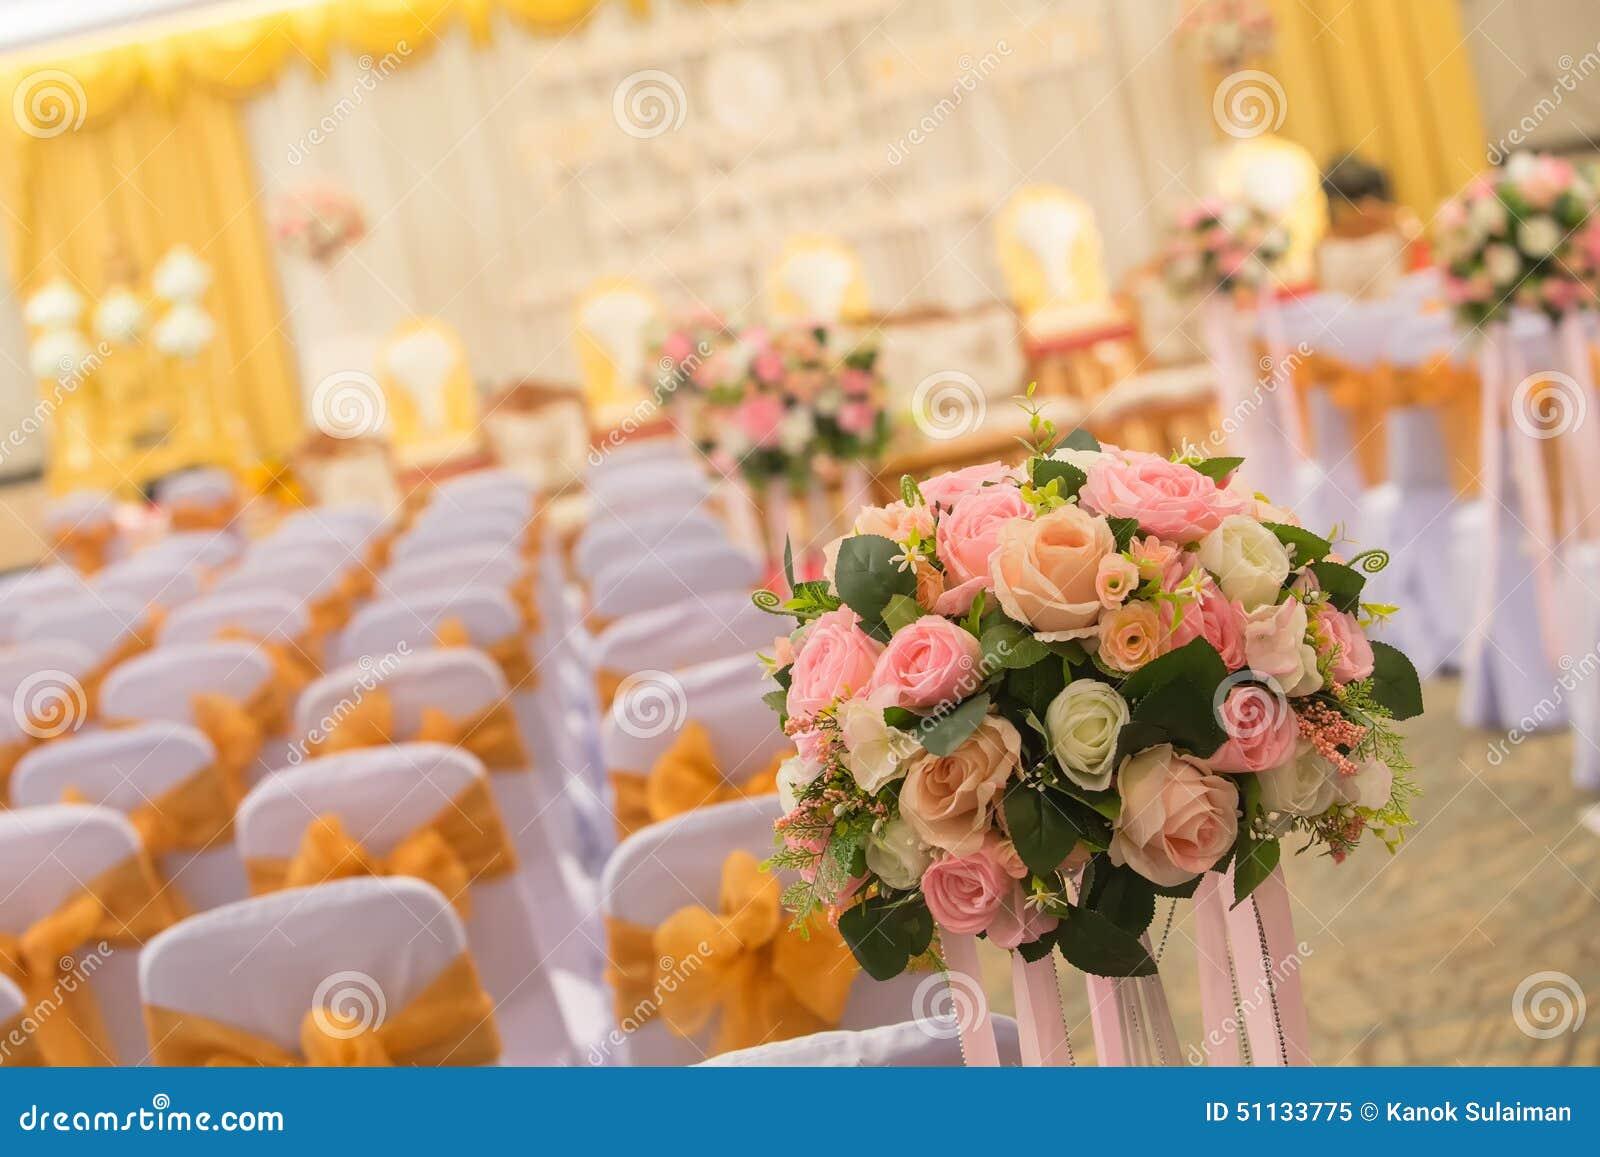 Family holiday, wedding